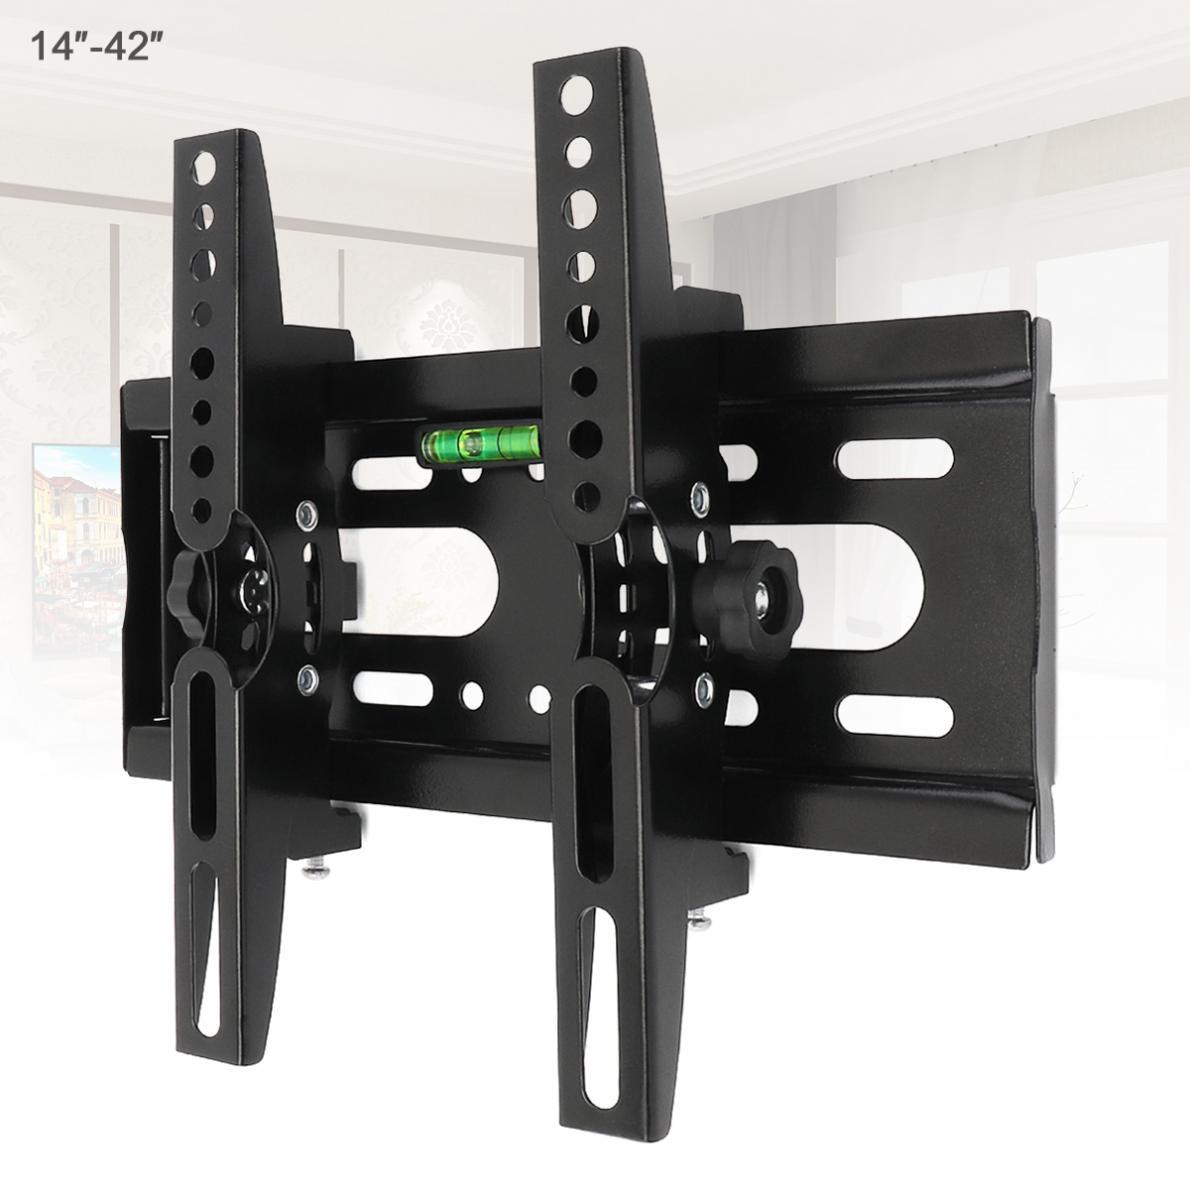 Universal 25KG Adjustable TV Wall Mount Bracket Flat Panel TV Frame Support 15 Degrees Tilt with Level for 14 - 42 Inch LCD LED